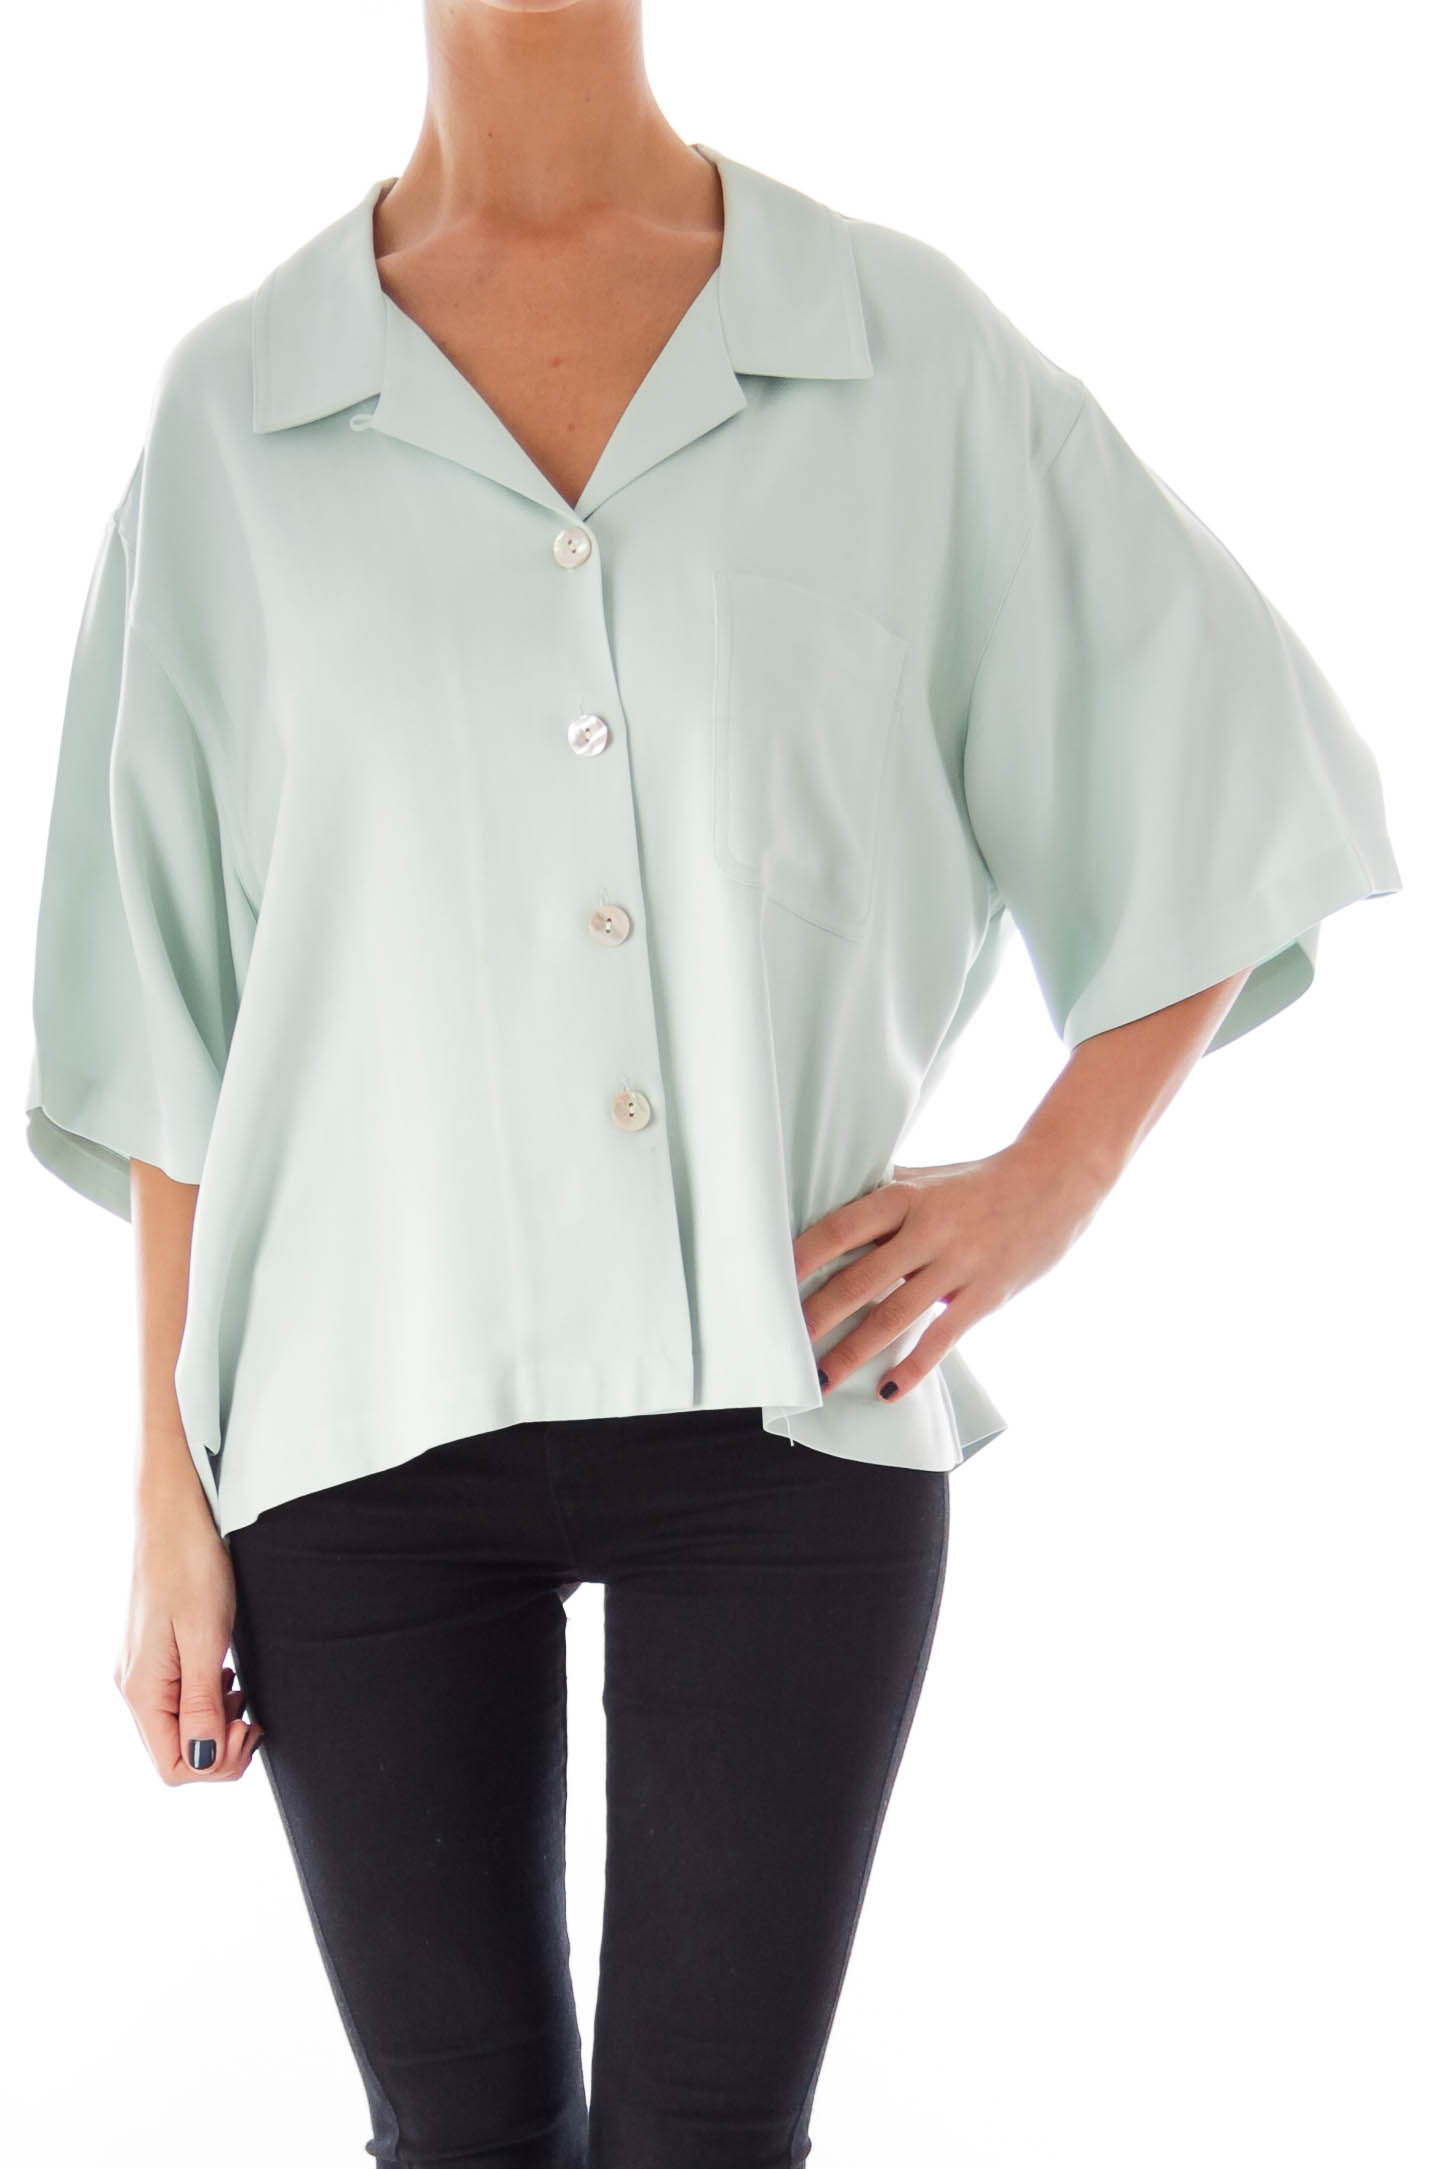 Pastel Blue Button Shirt